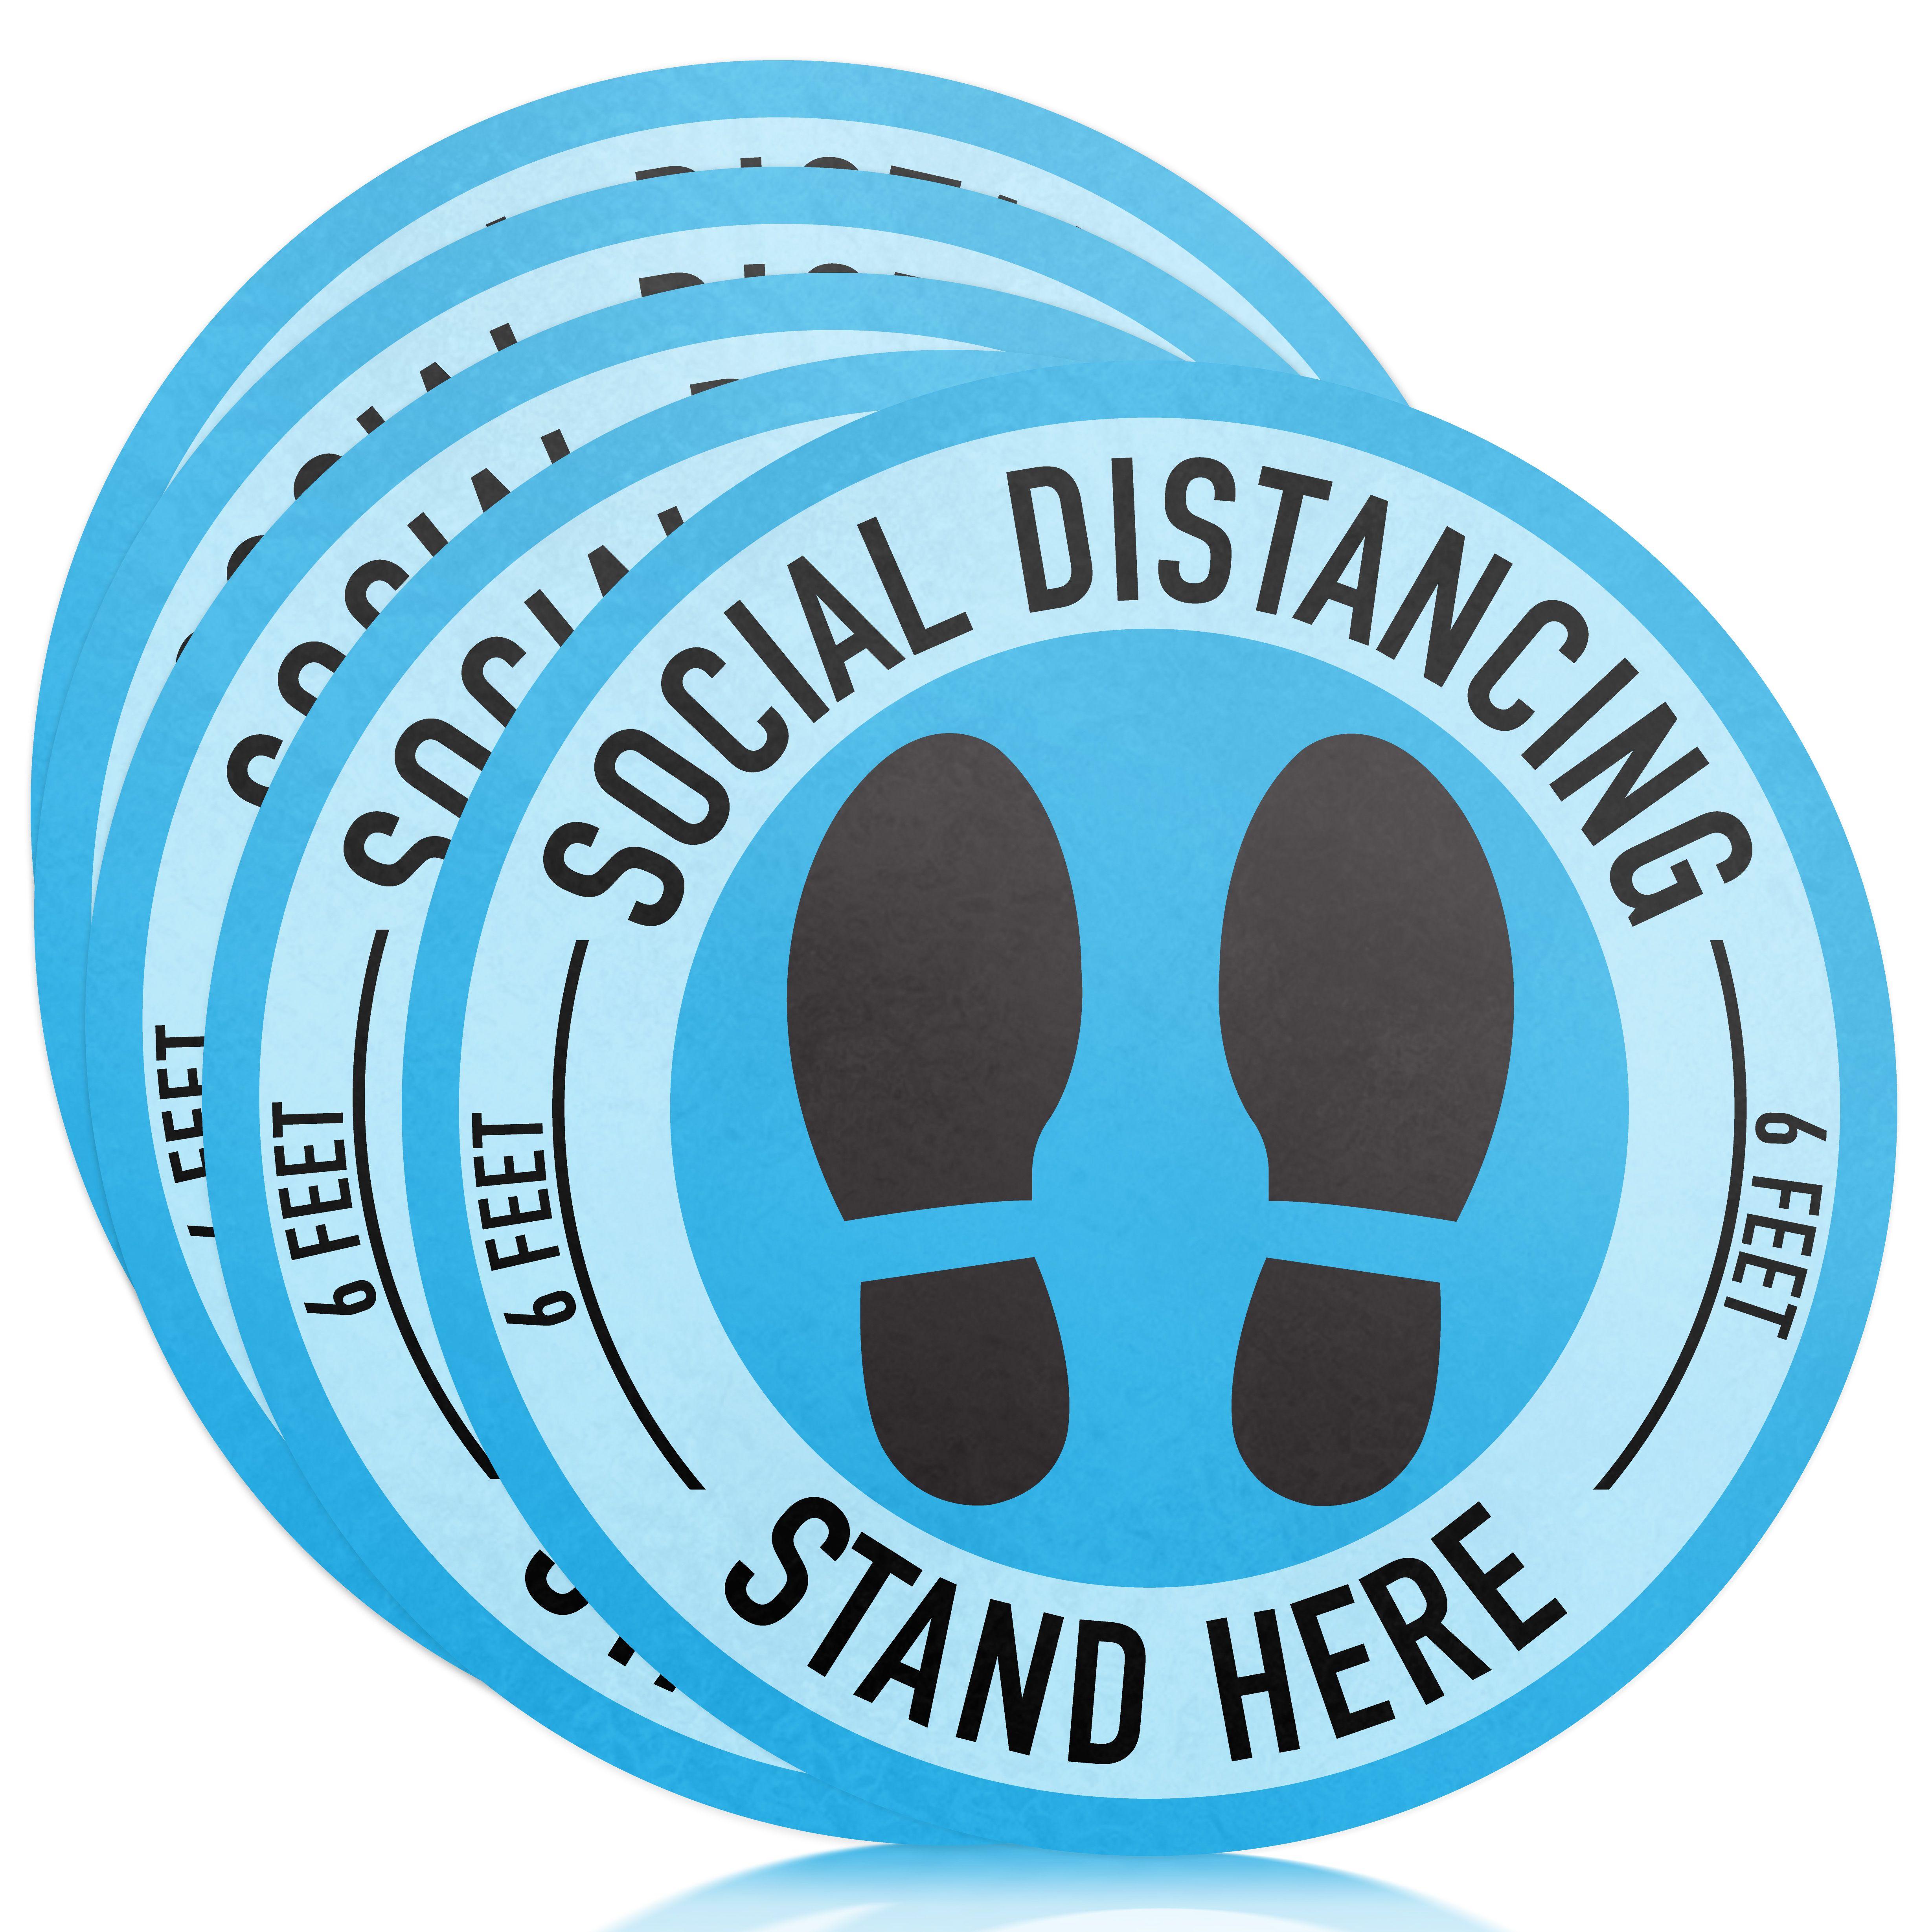 Social Distancing Floor Decals 11 5 Pack 6 Feet Apart Sticker Social Distancing Sign Gadgets And Gizmos Floor Decal Floor Stickers